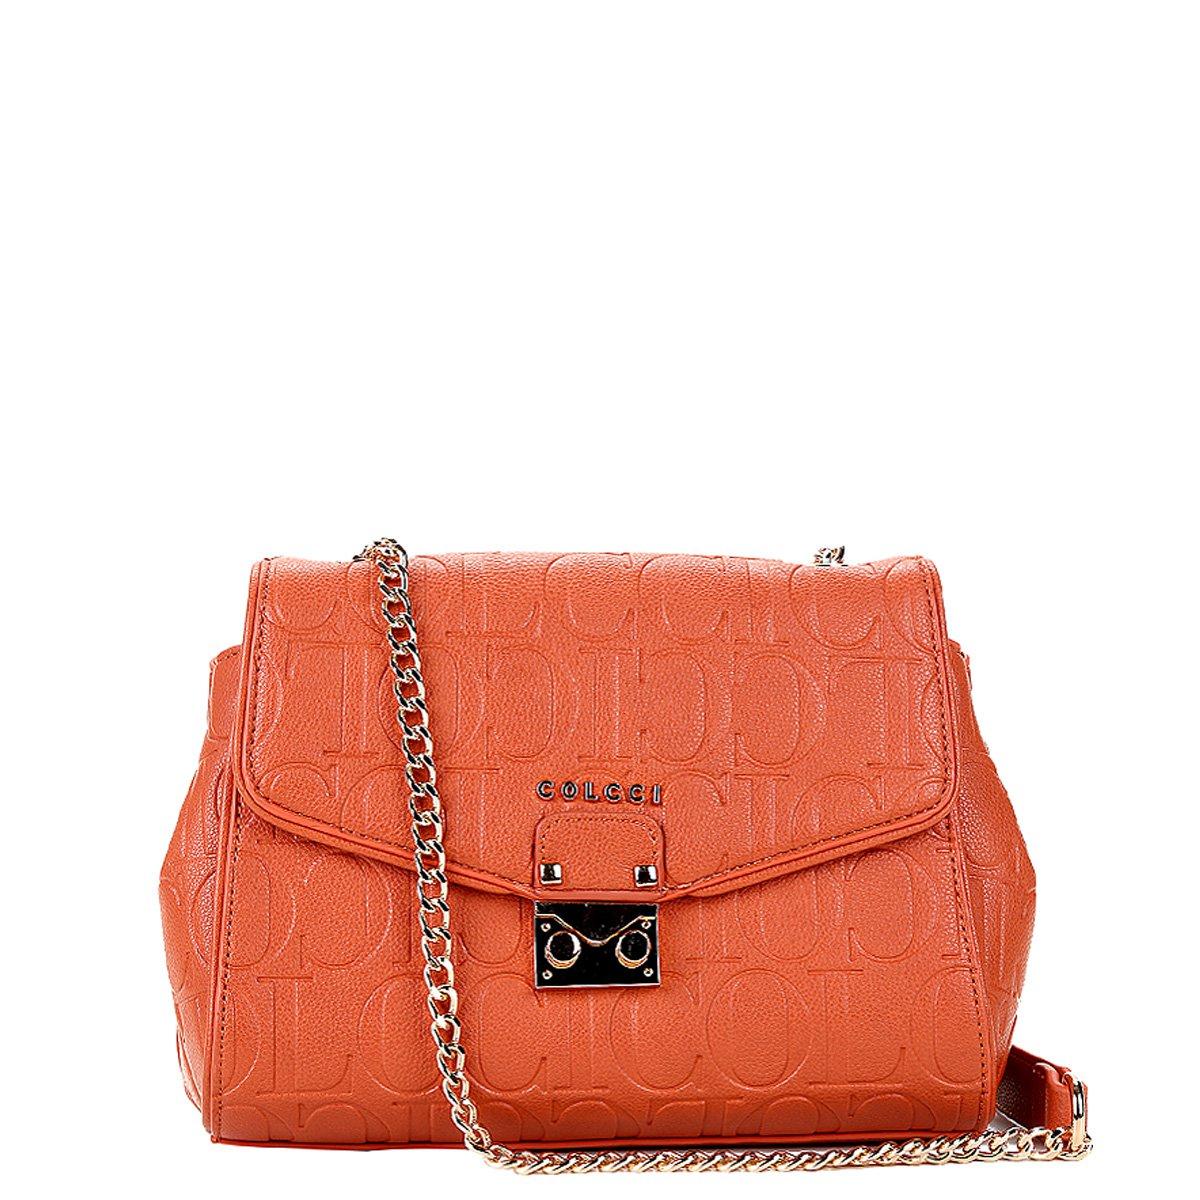 Bolsa Colcci Flap Pequena Feminina - Compre Agora  761b06f1eaa